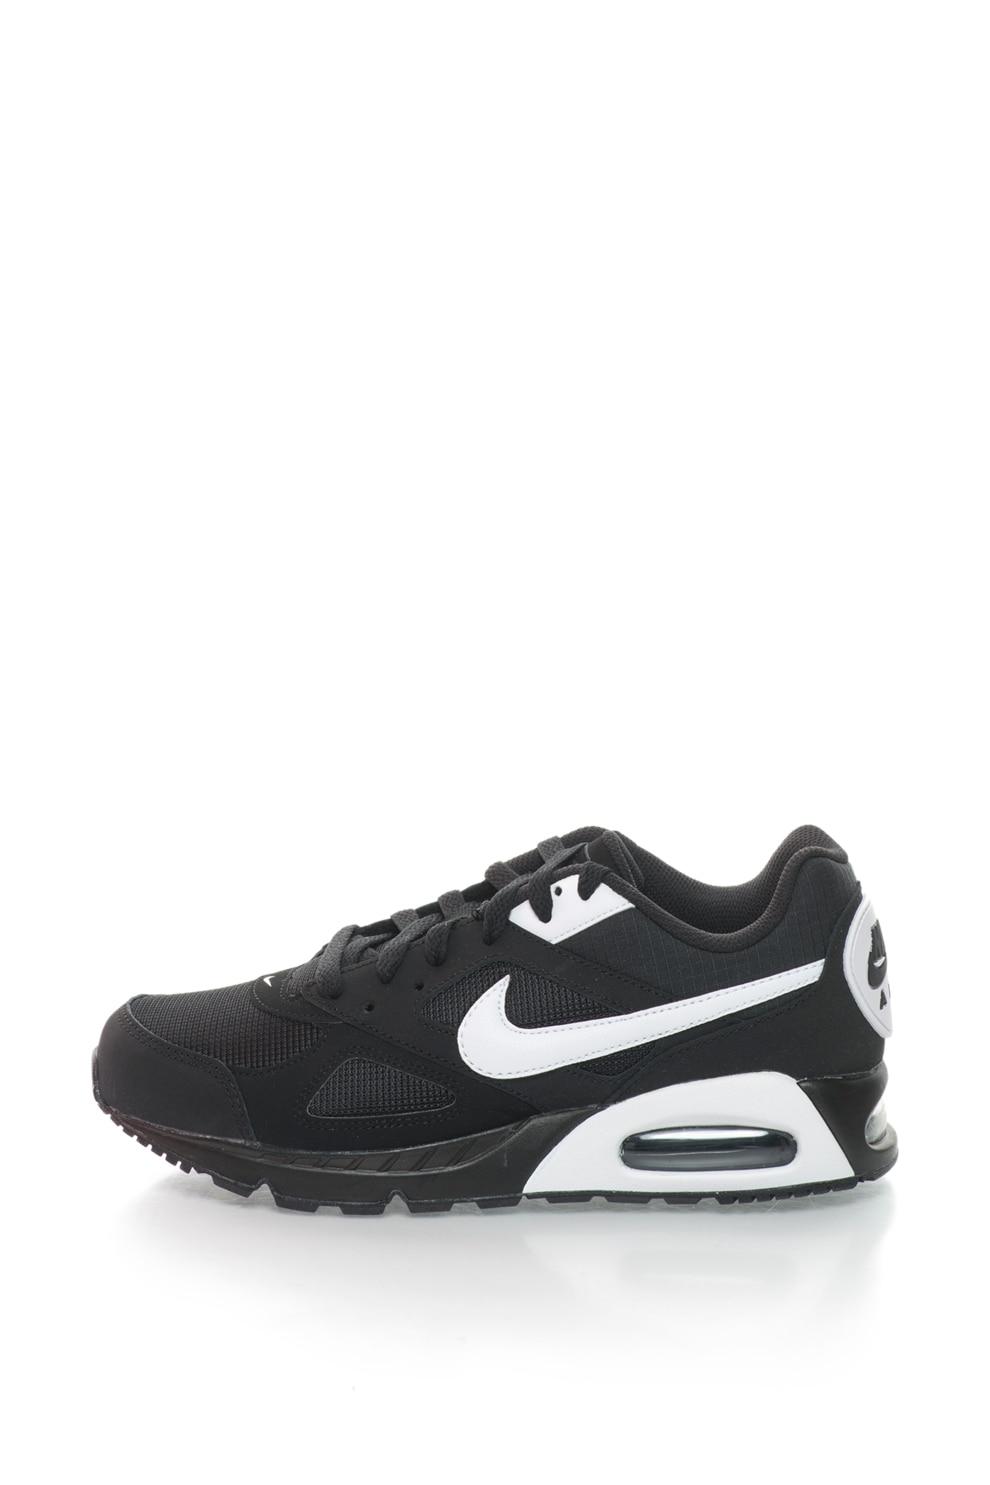 Resentimiento Habitar Él mismo  Nike, Pantofi sport cu garnituri de piele intoarsa Air Max Ivo, Negru, 6 -  eMAG.ro